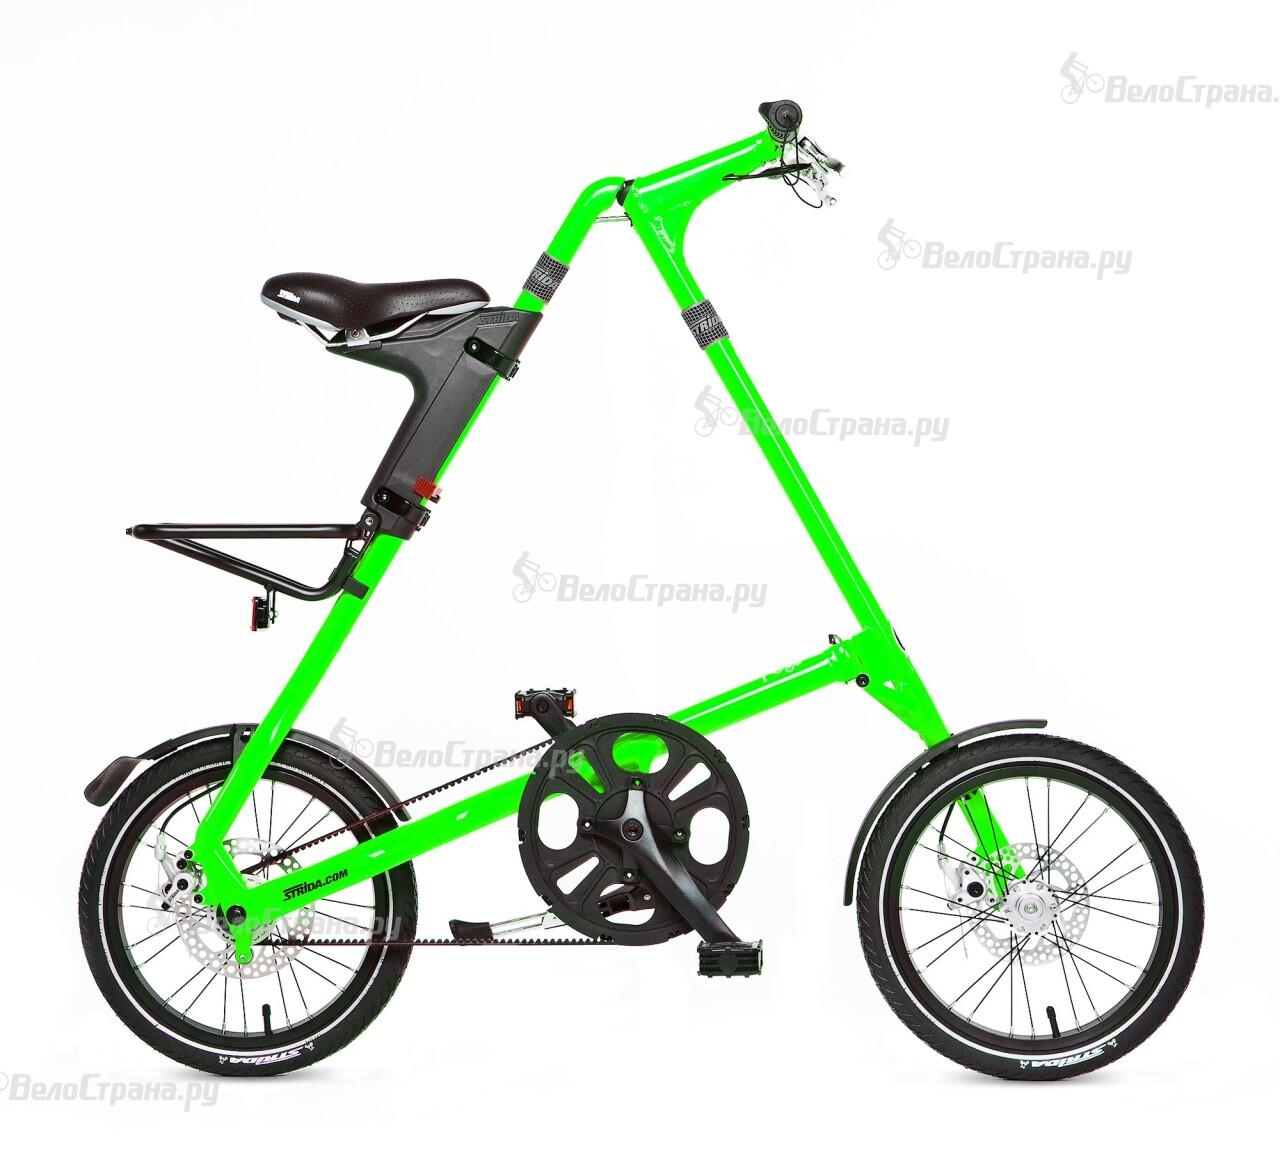 Велосипед Strida 5.2 (2014)